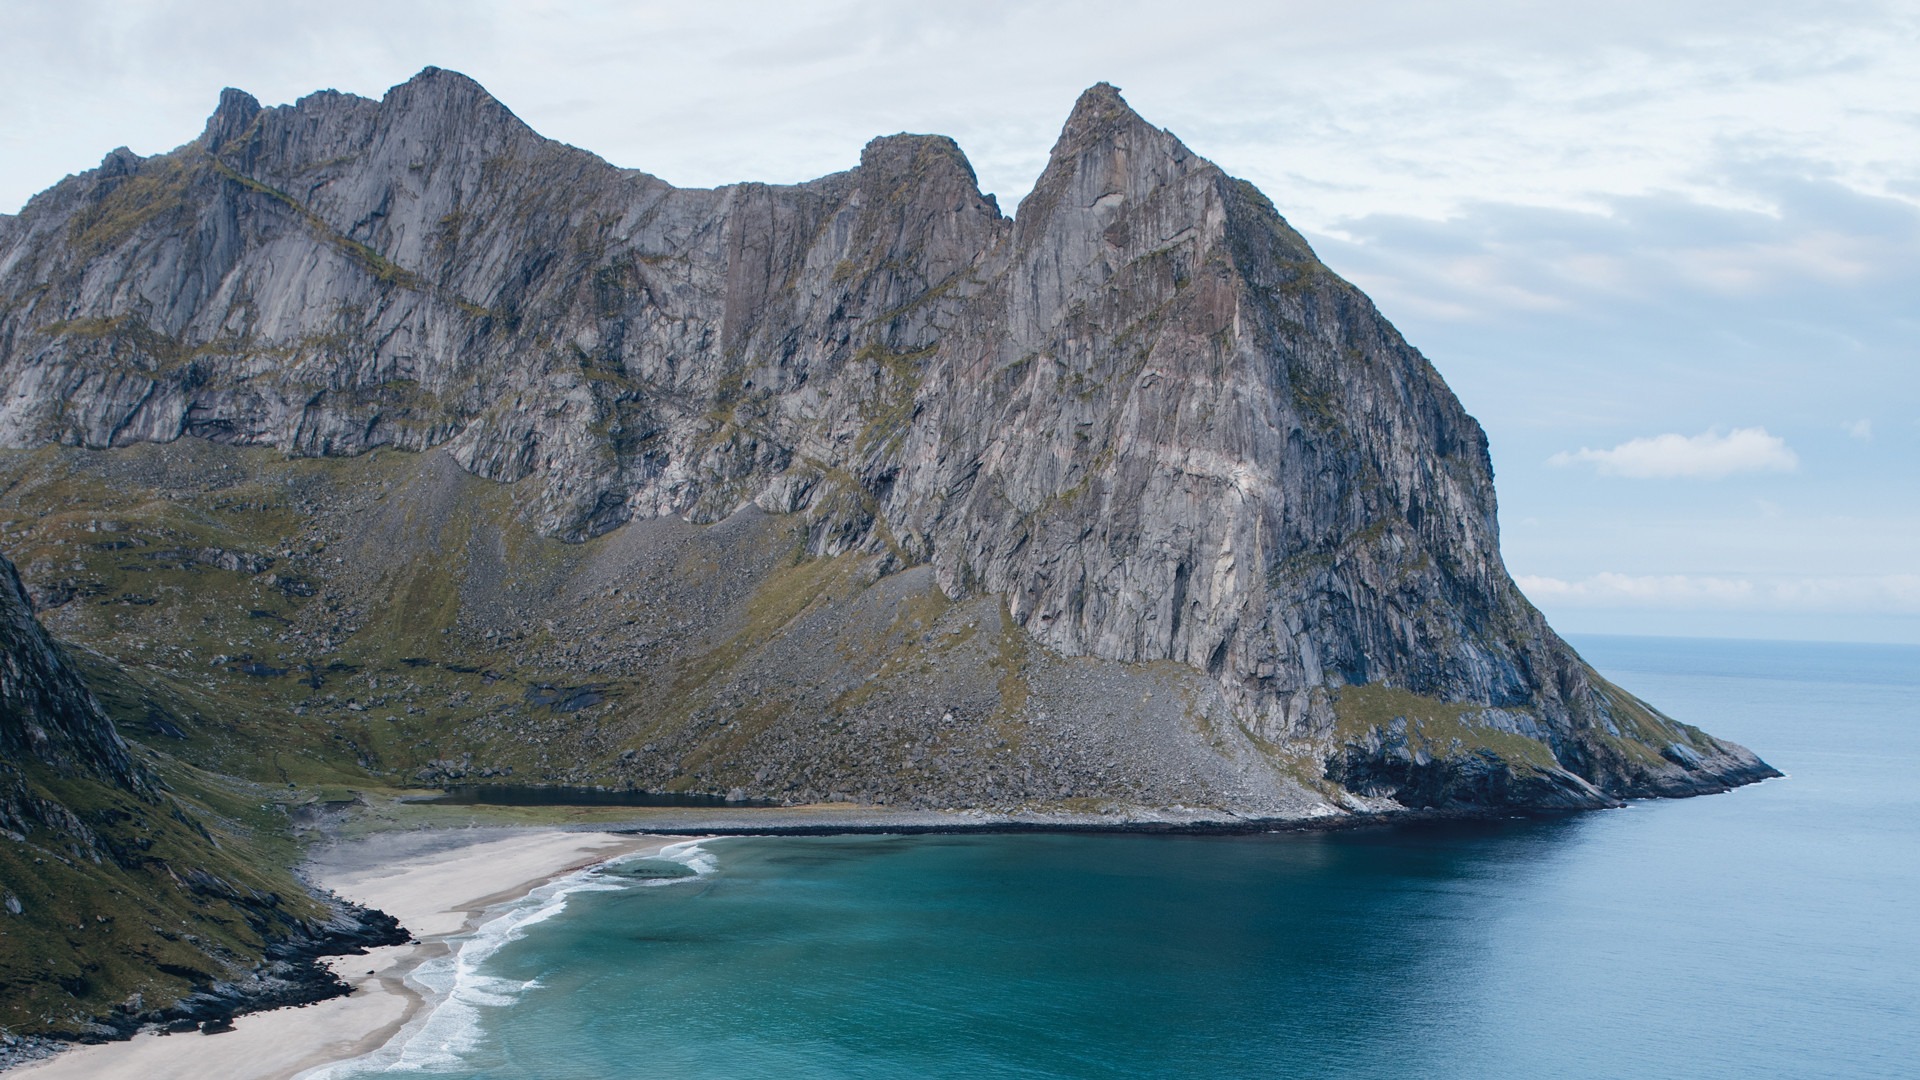 Kvalvika Beach in Norway's Lofoten Islands